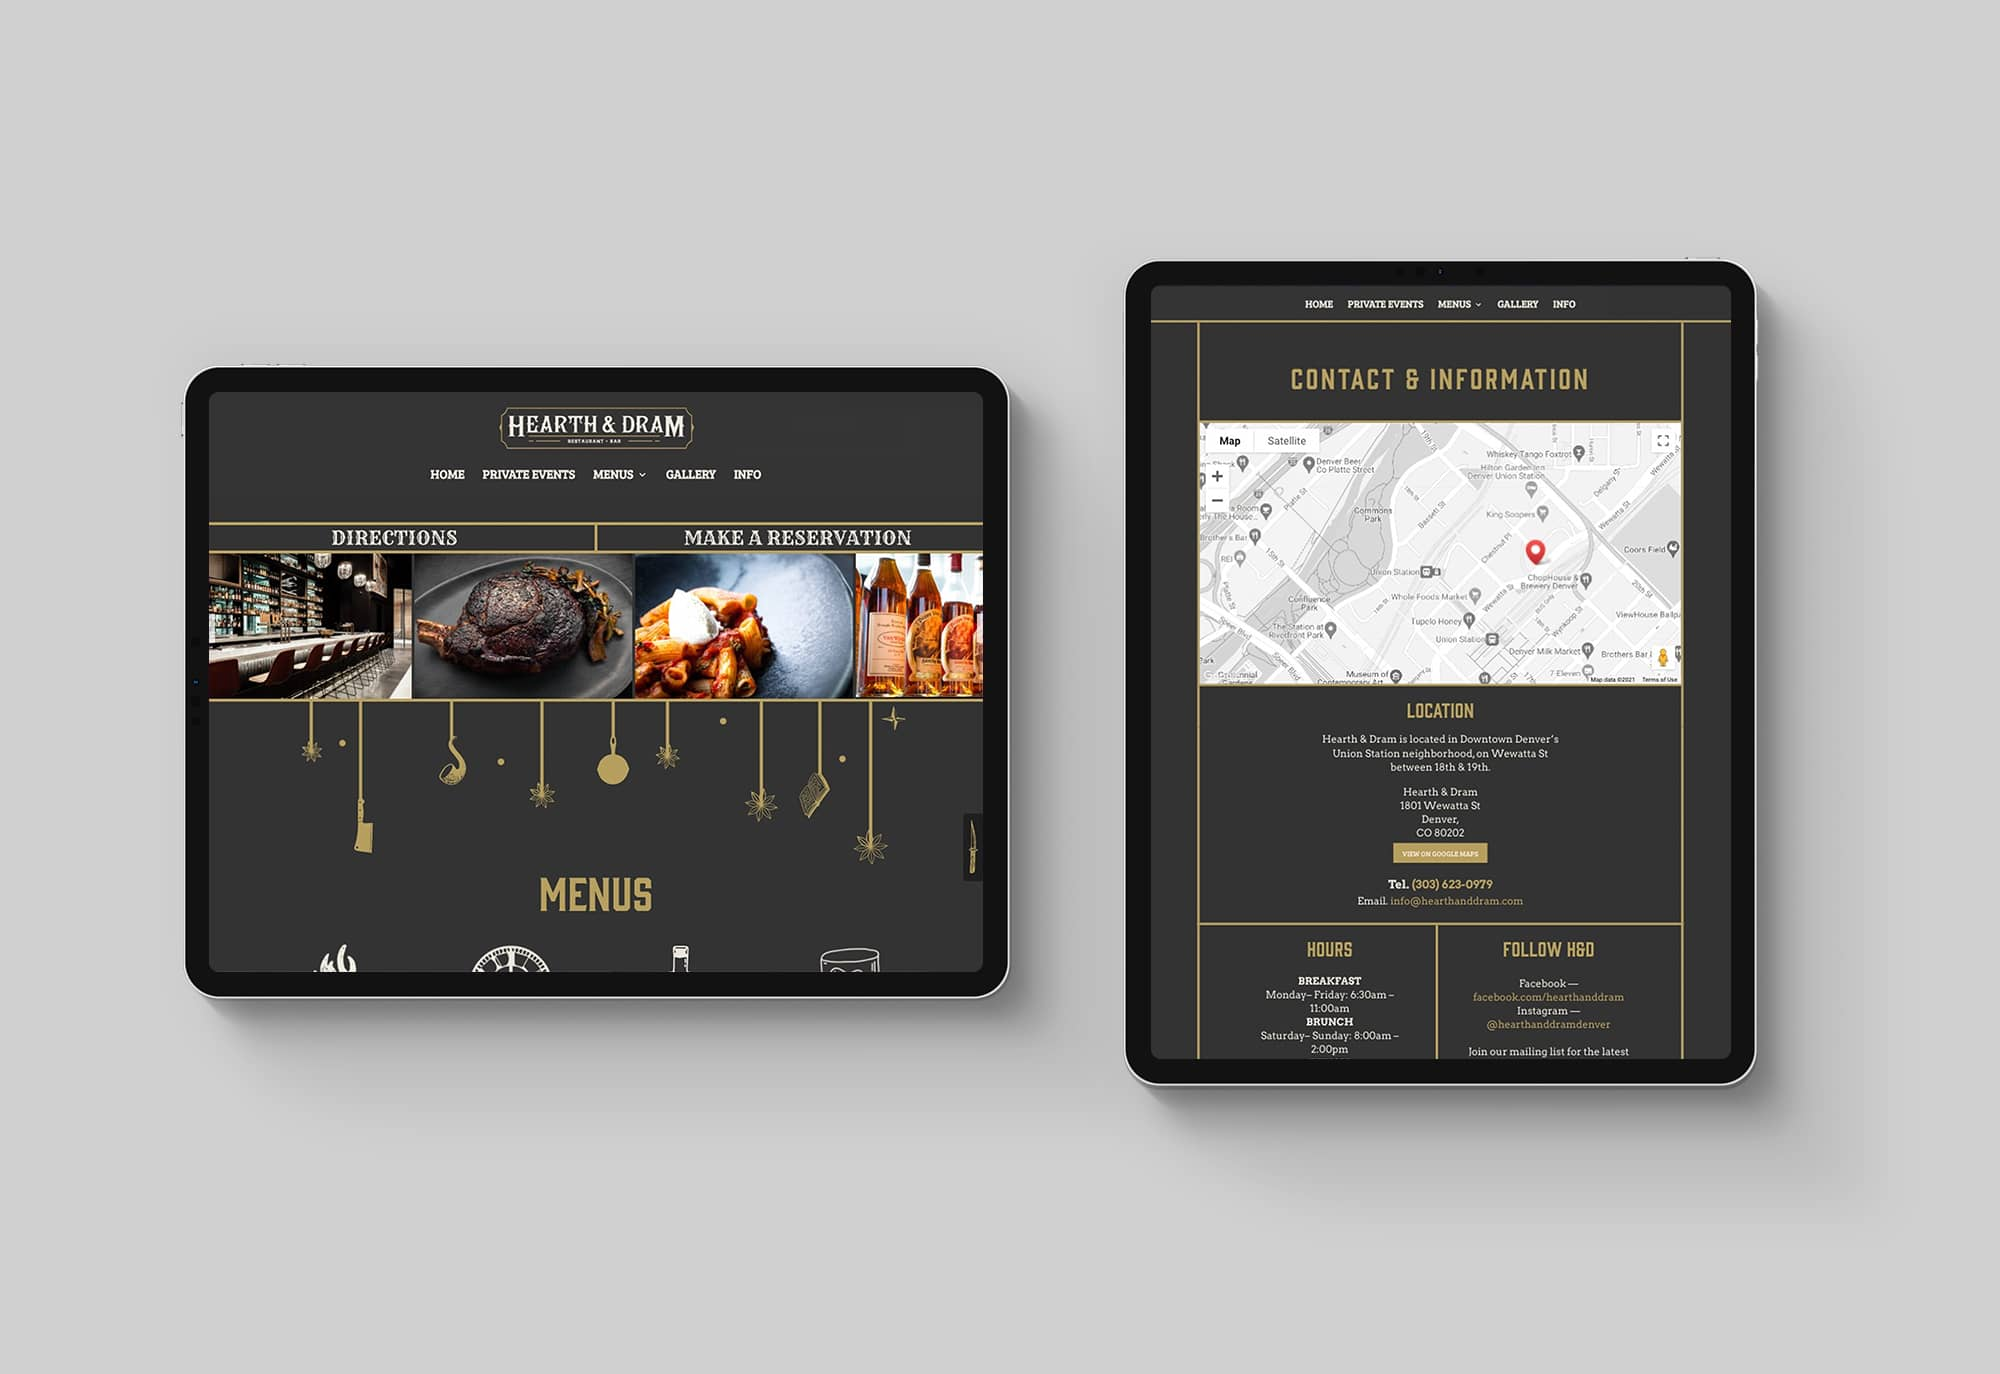 Hearth & Dram website on ipad